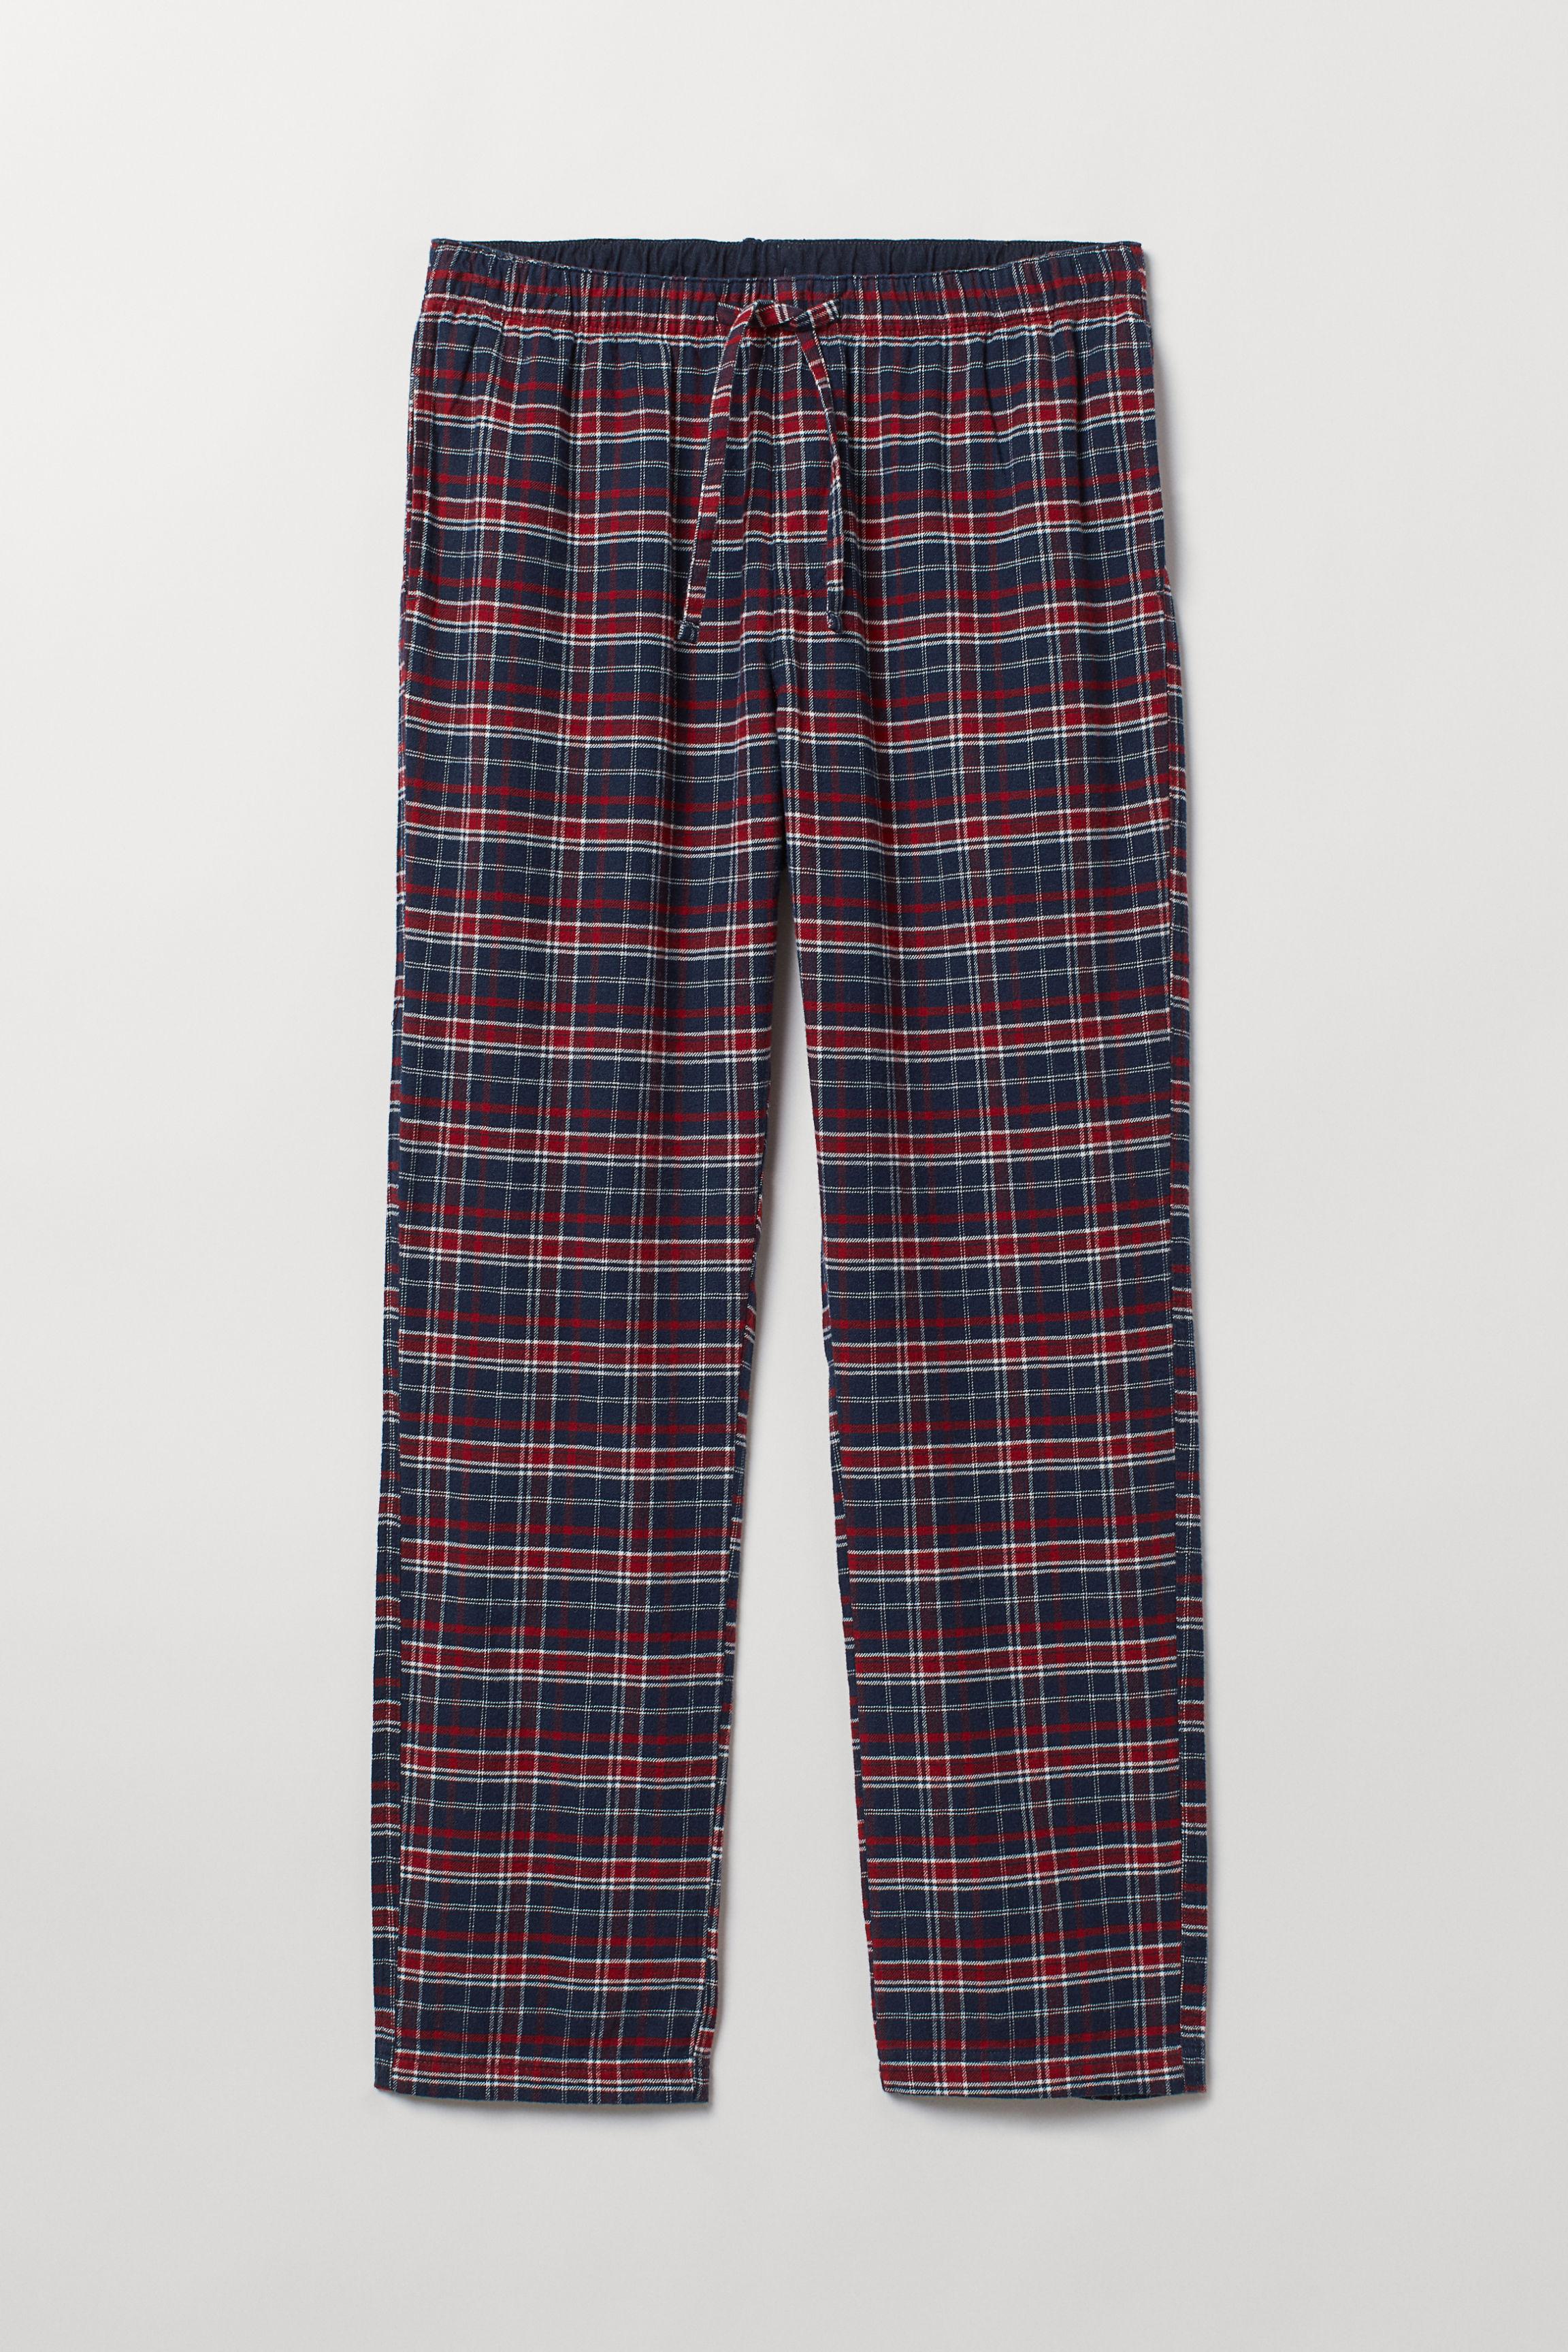 1e6ce0e3ef0cf Flanel Pijama Altı - Koyu mavi/Kırmızı kareli - ERKEK   H&M TR